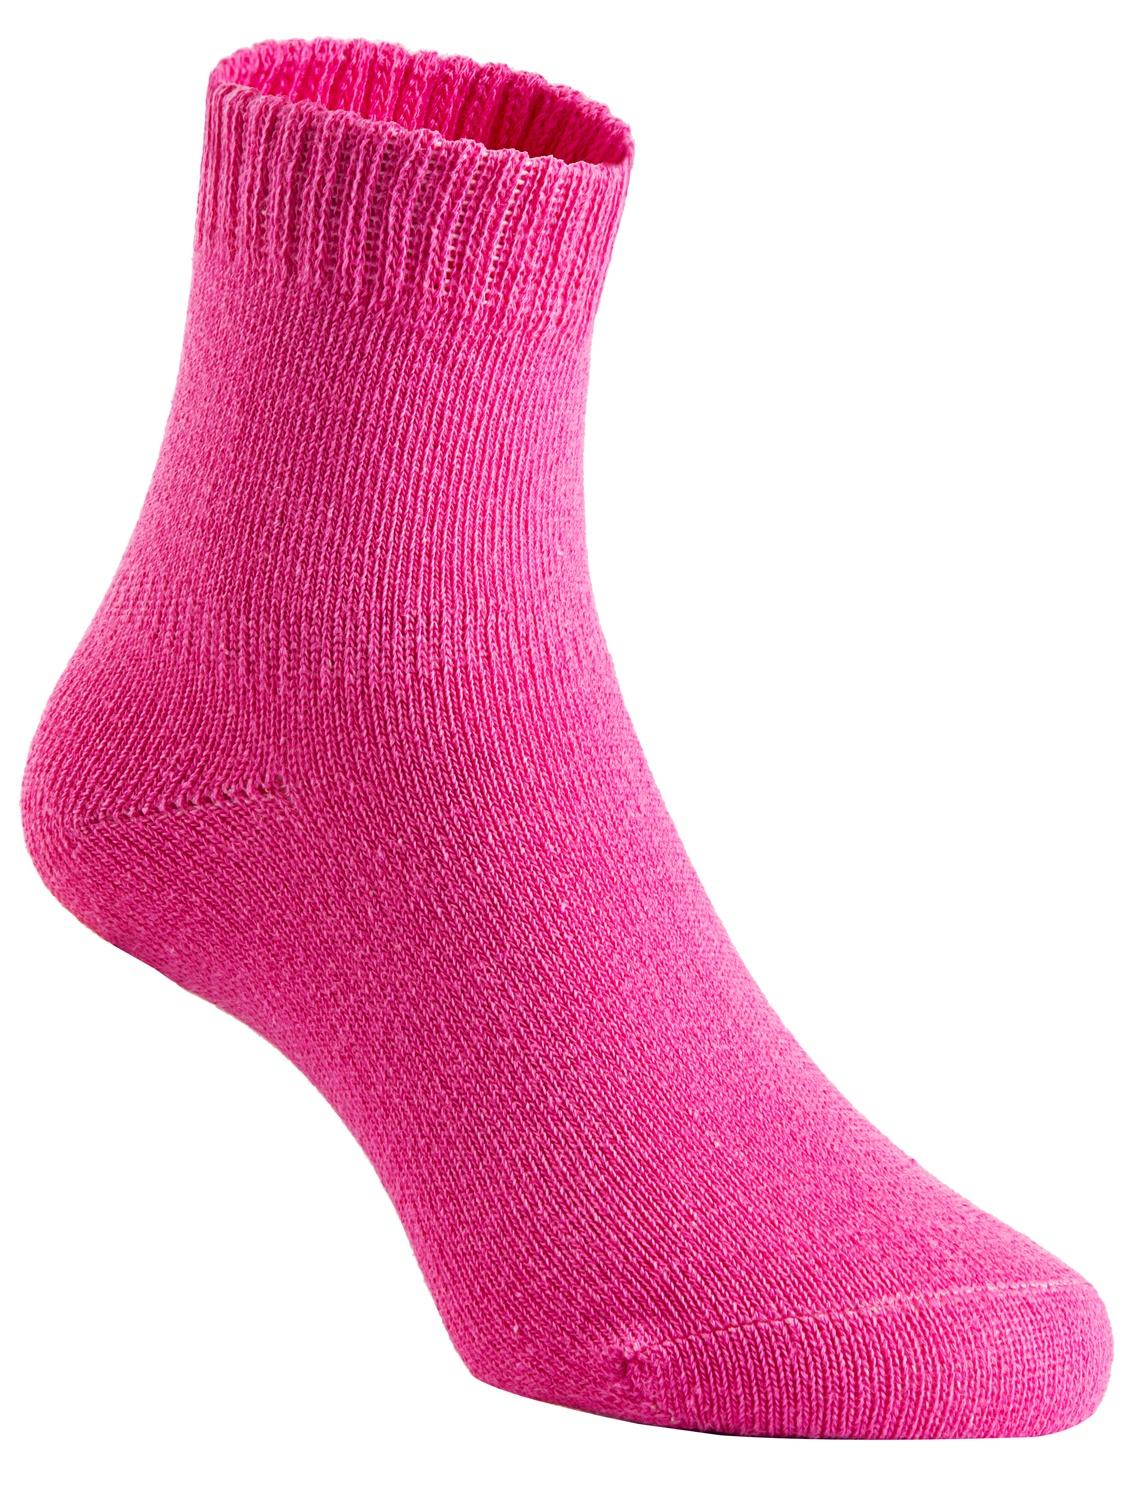 Lovely Annie Girls Children 4 Pairs Pack Non Slip Pure Cotton Socks 3Y-5Y(Rose)